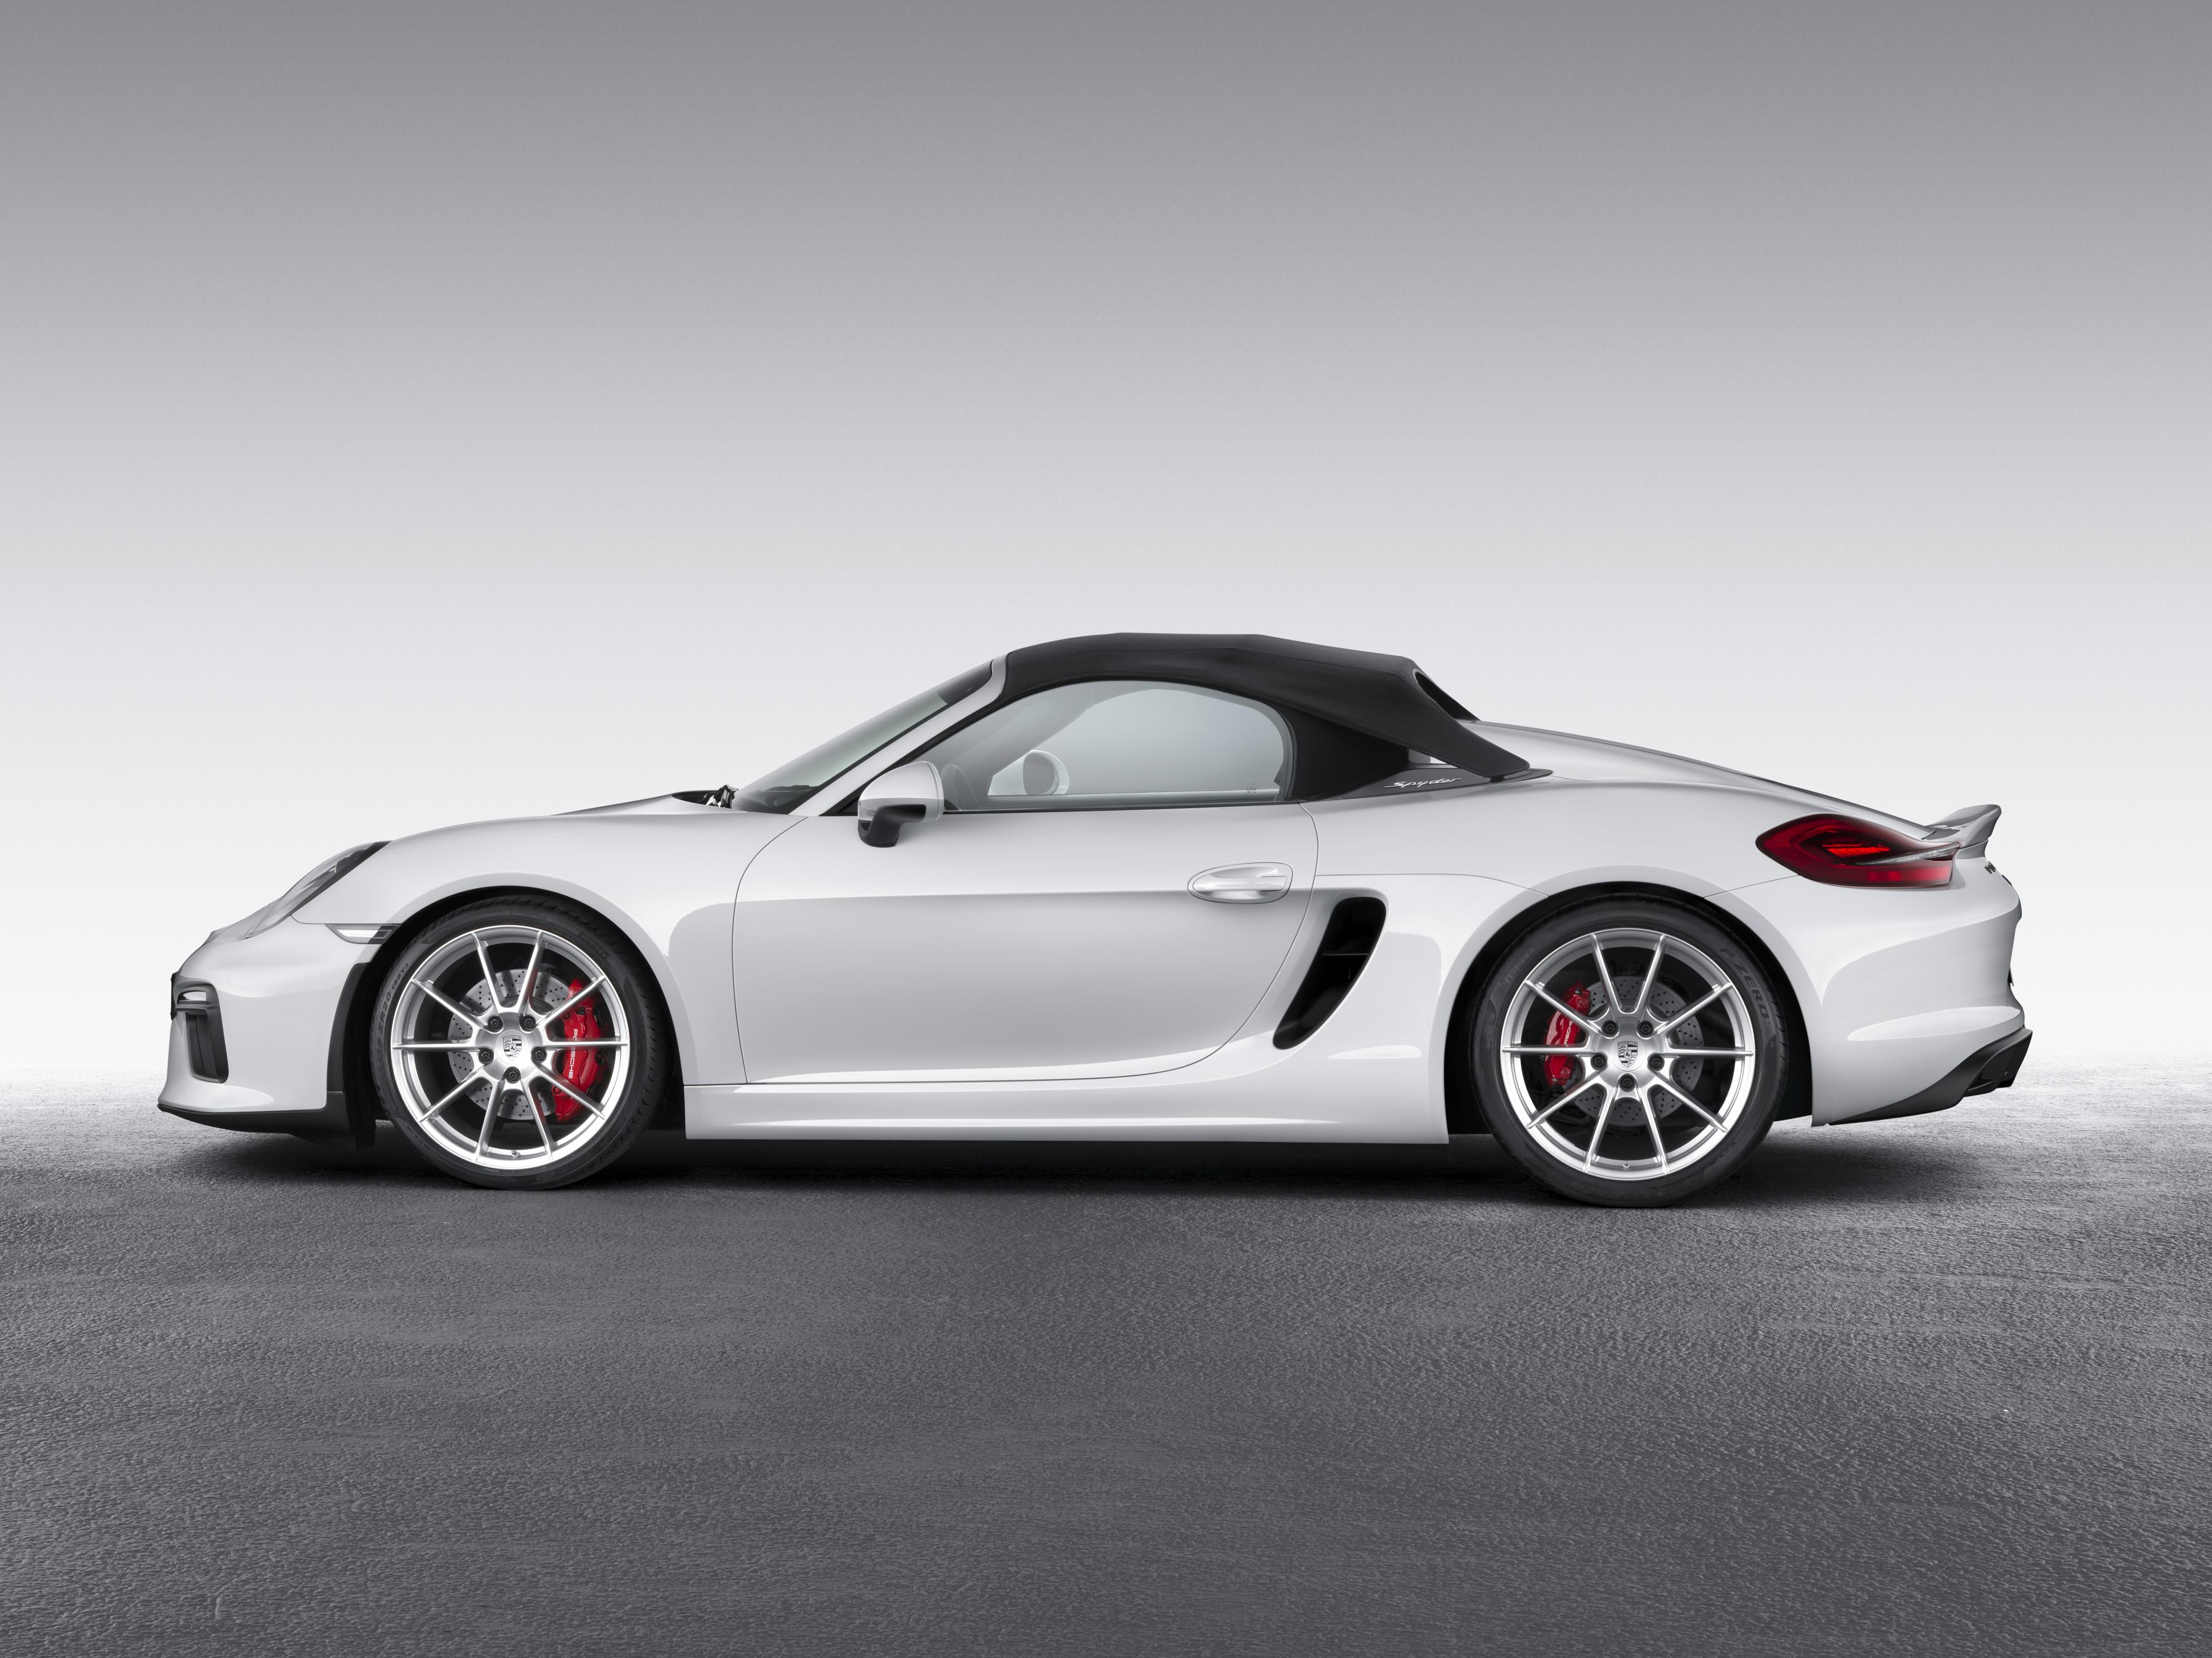 Porsche 2016 Boxster Spyder - profil / side face - close